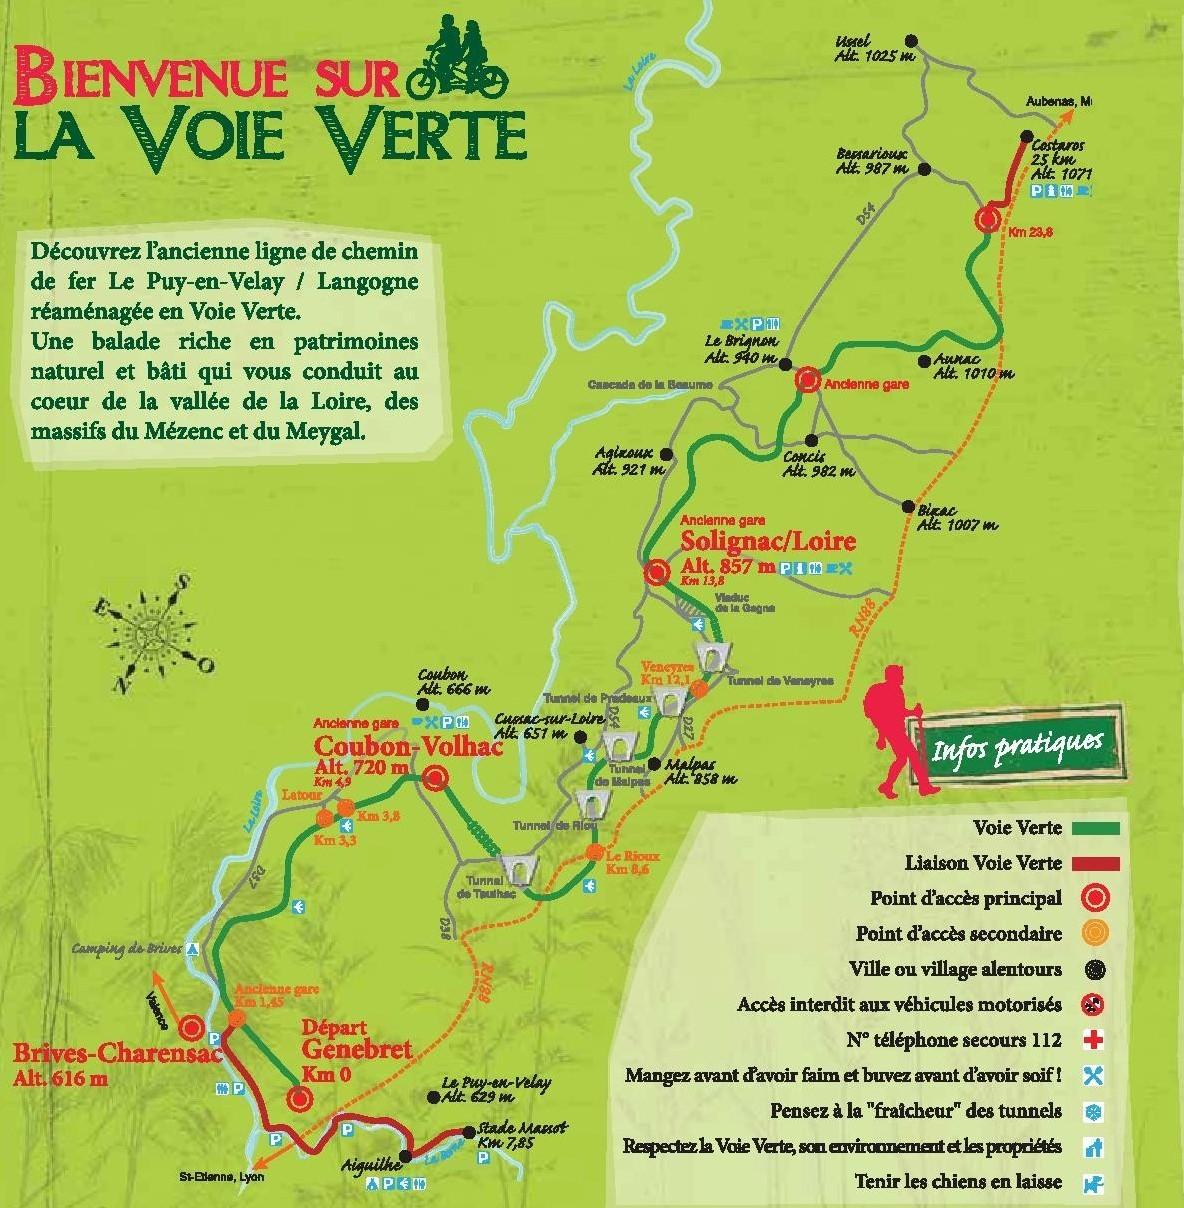 Voie Verte - Balade à Brives-Charensac